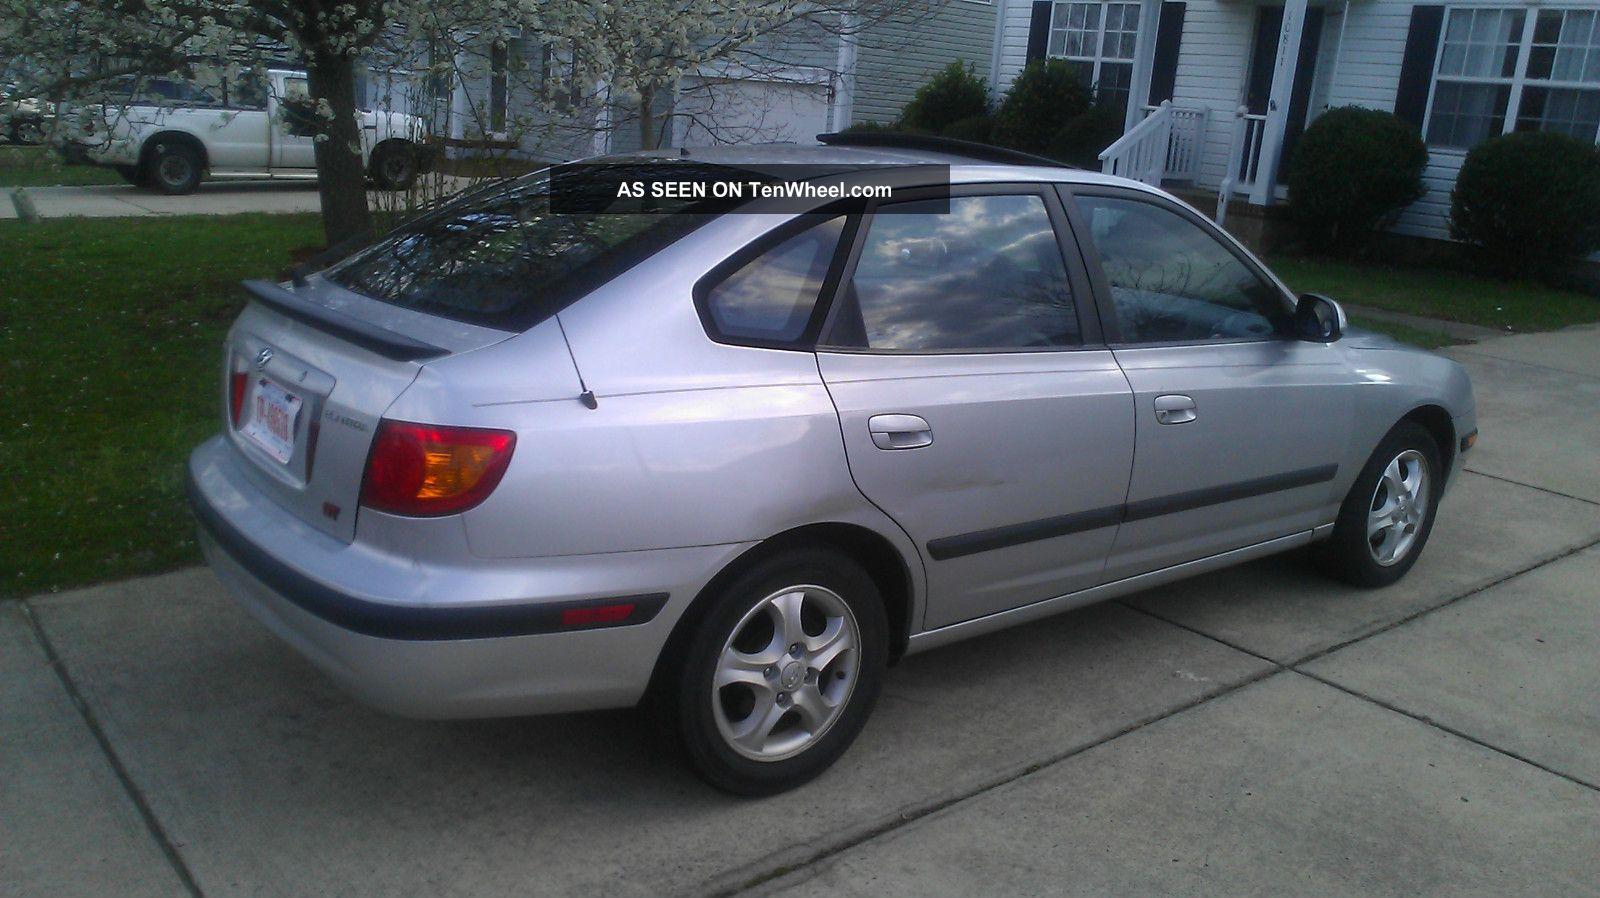 2003 Hyundai Elantra Gt Hatchback 5 Door